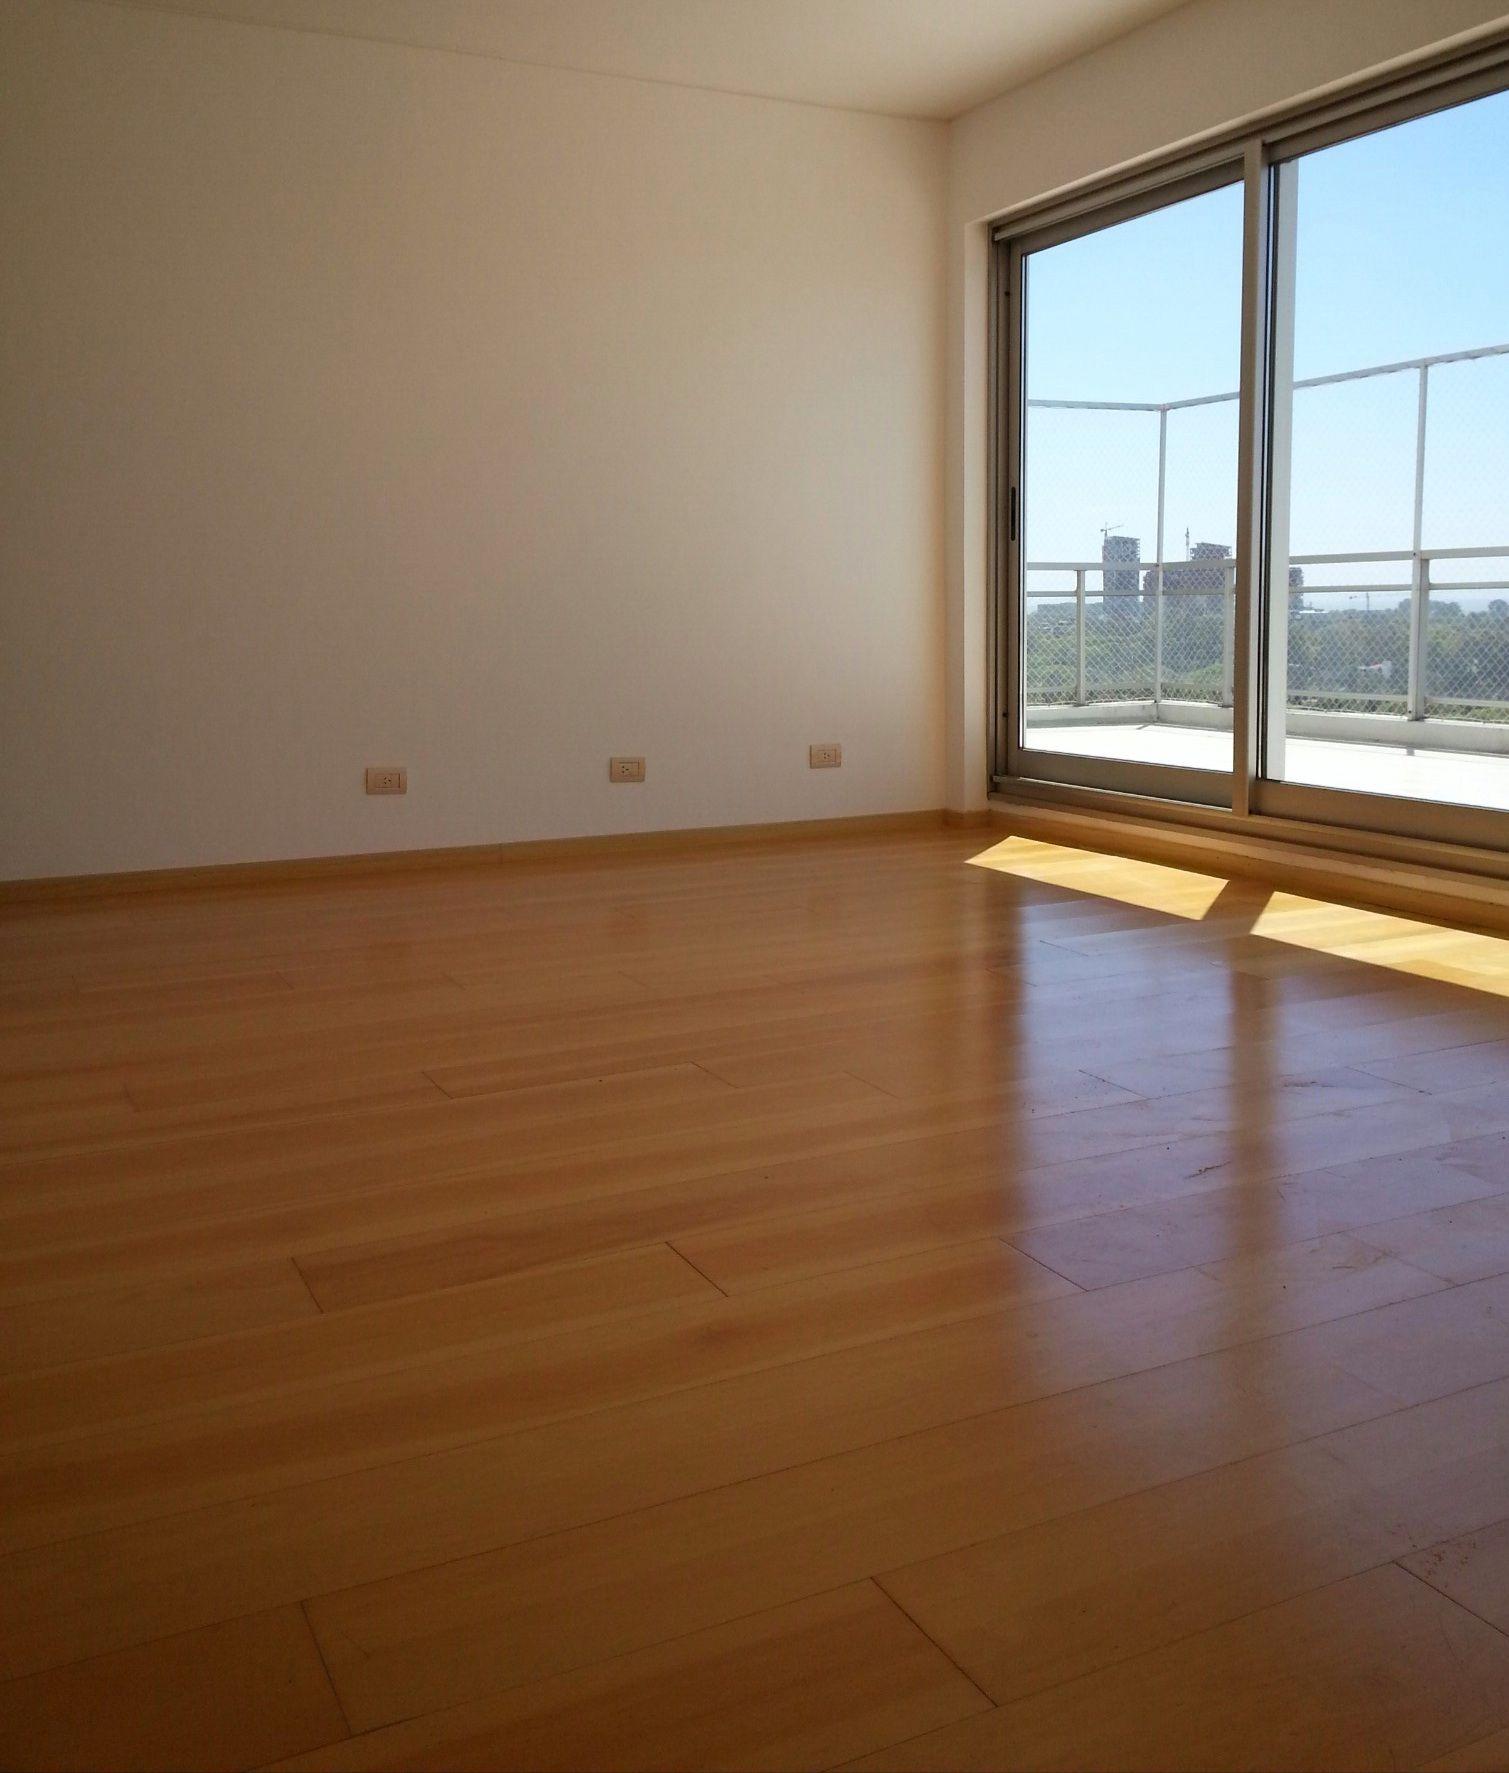 Piso laminado en madera piso flotante prefinished pisos for Decoracion dormitorios piso flotante